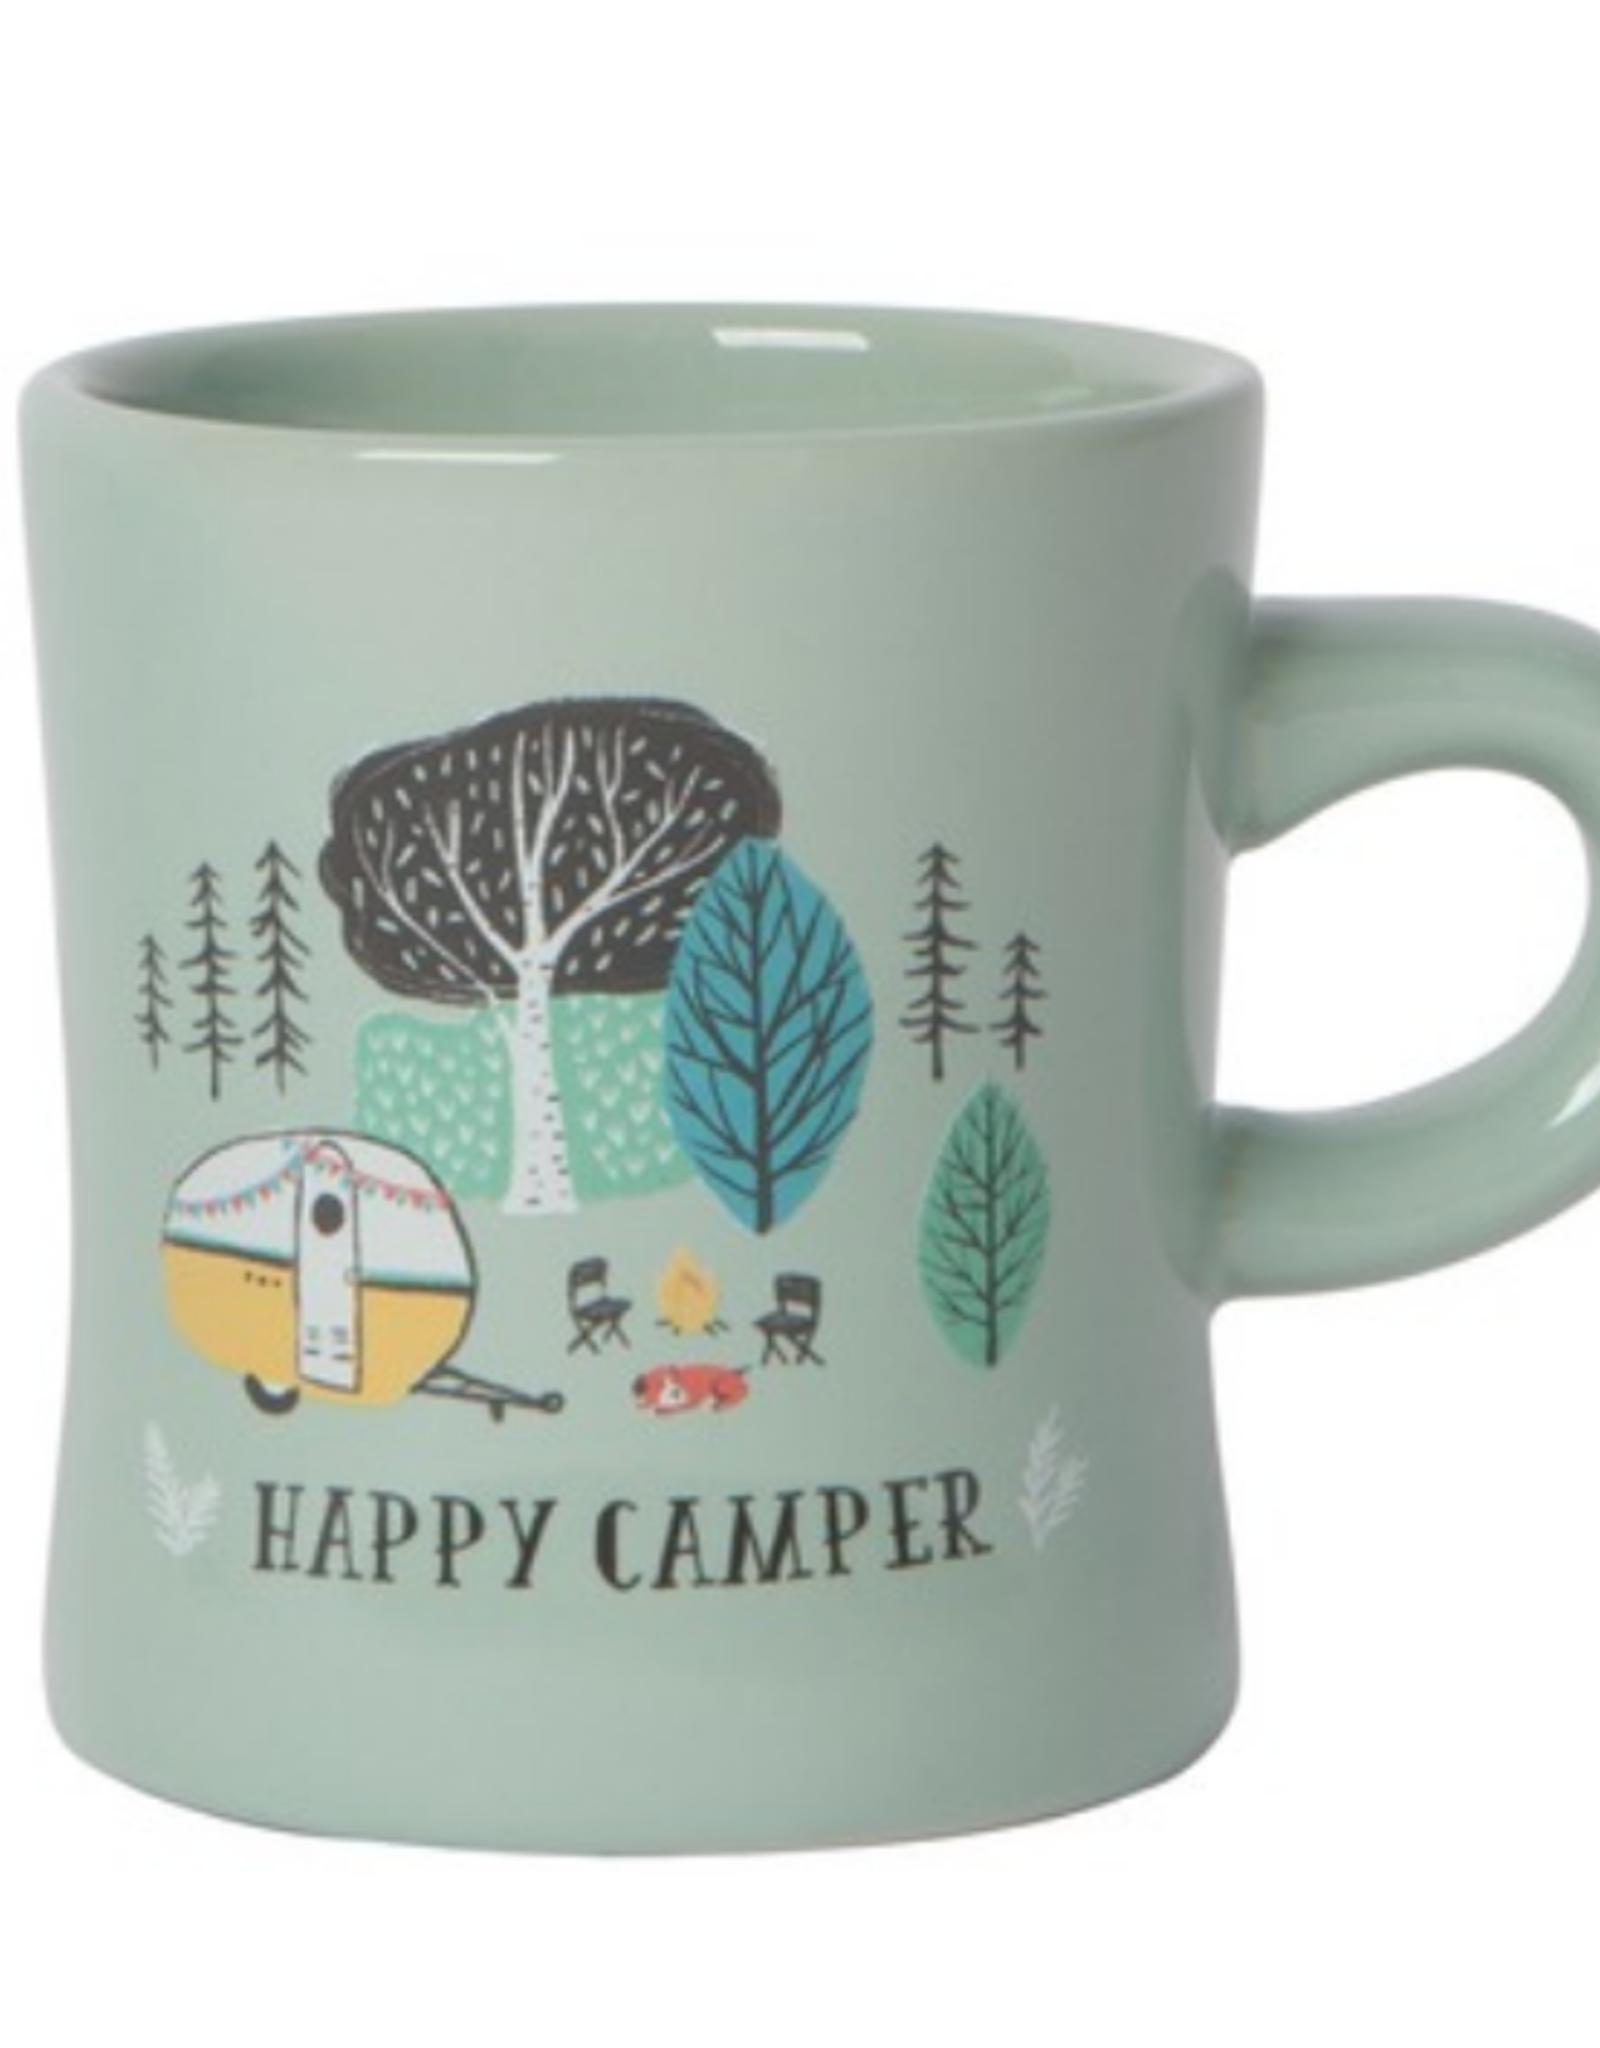 Danica Danica - Mug Diner Happy Camper